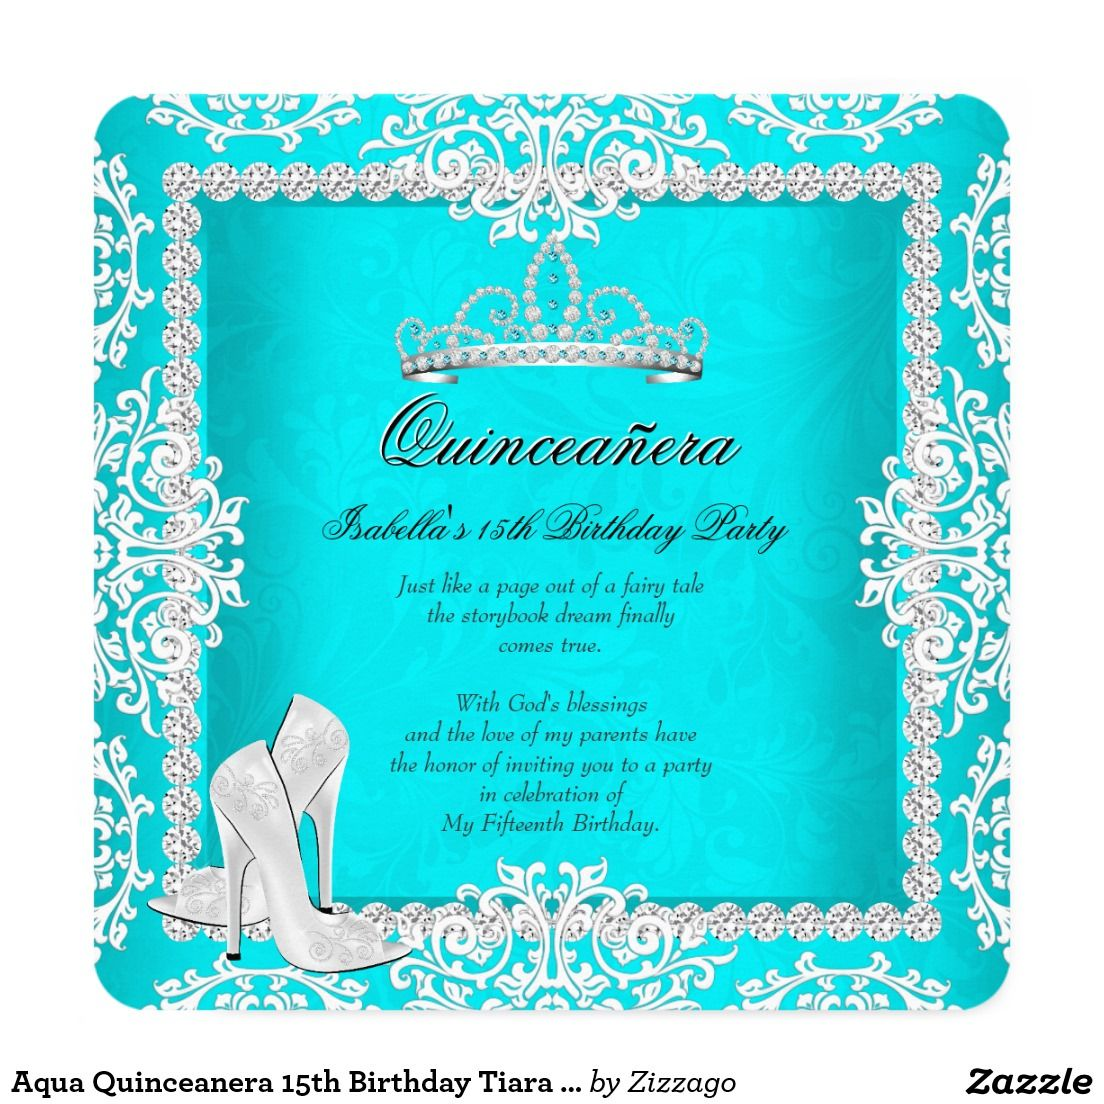 Aqua Quinceanera 15th Birthday Tiara High Heels Invitation ...